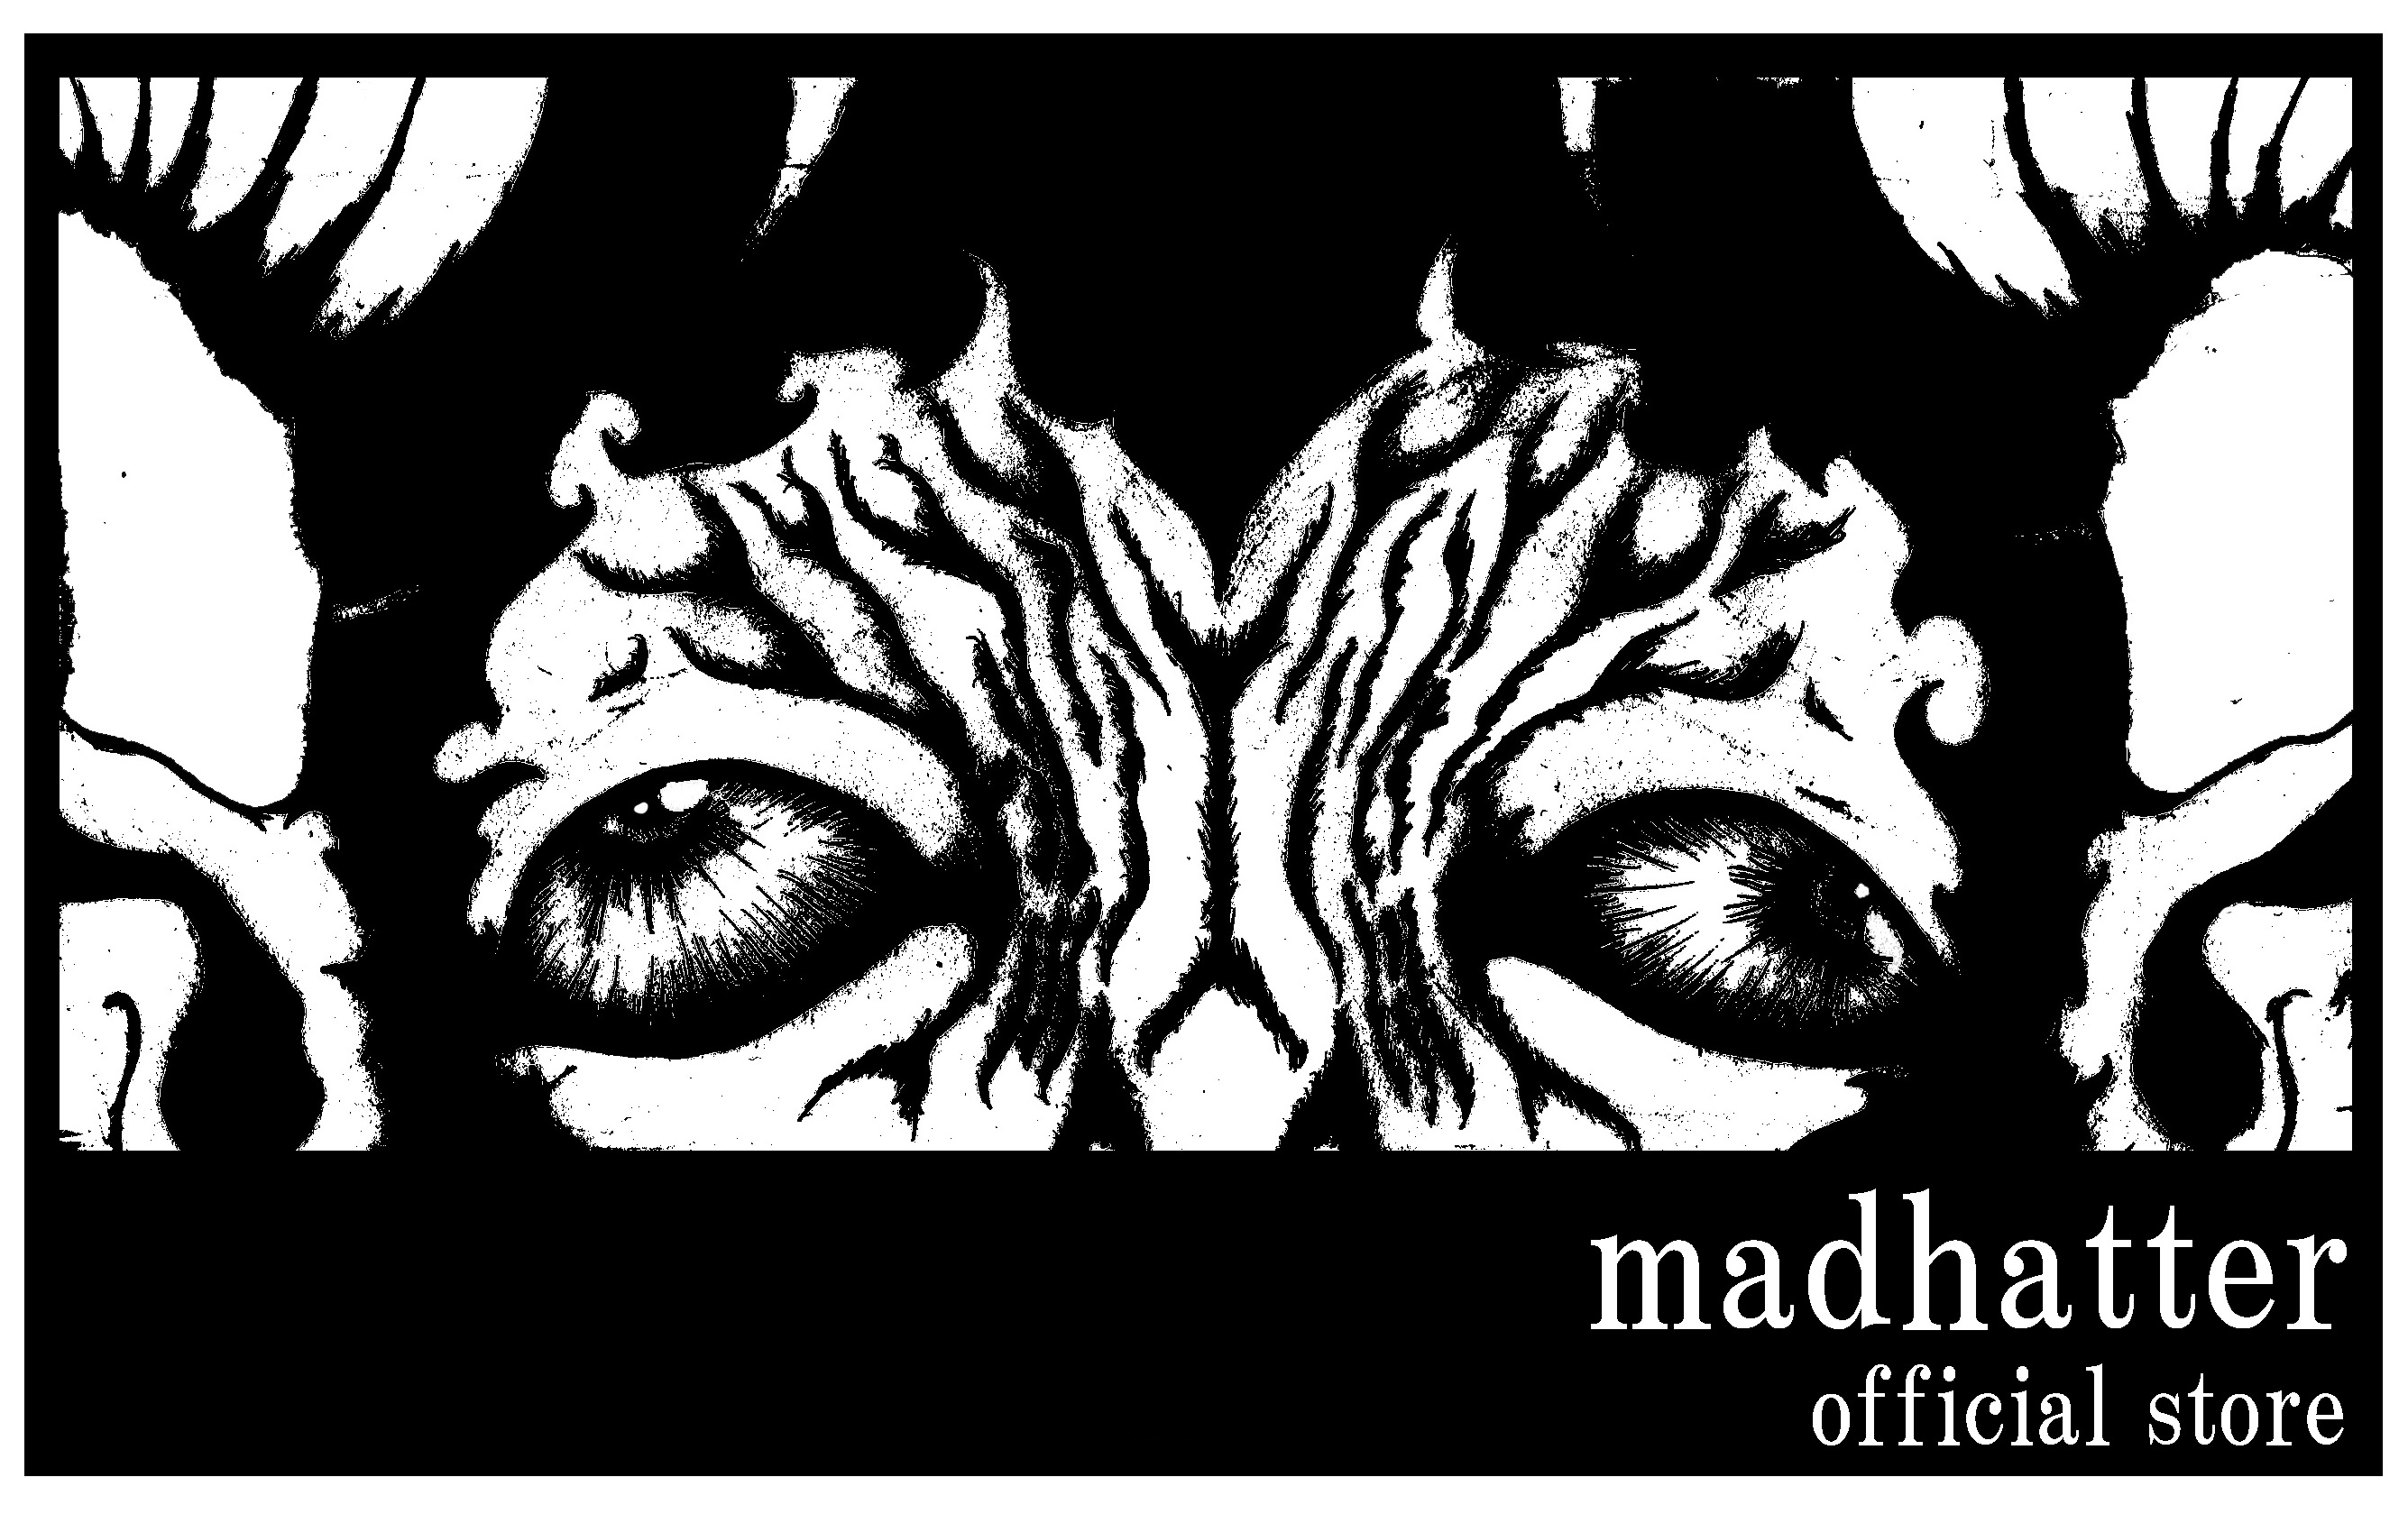 MADHATTER web store